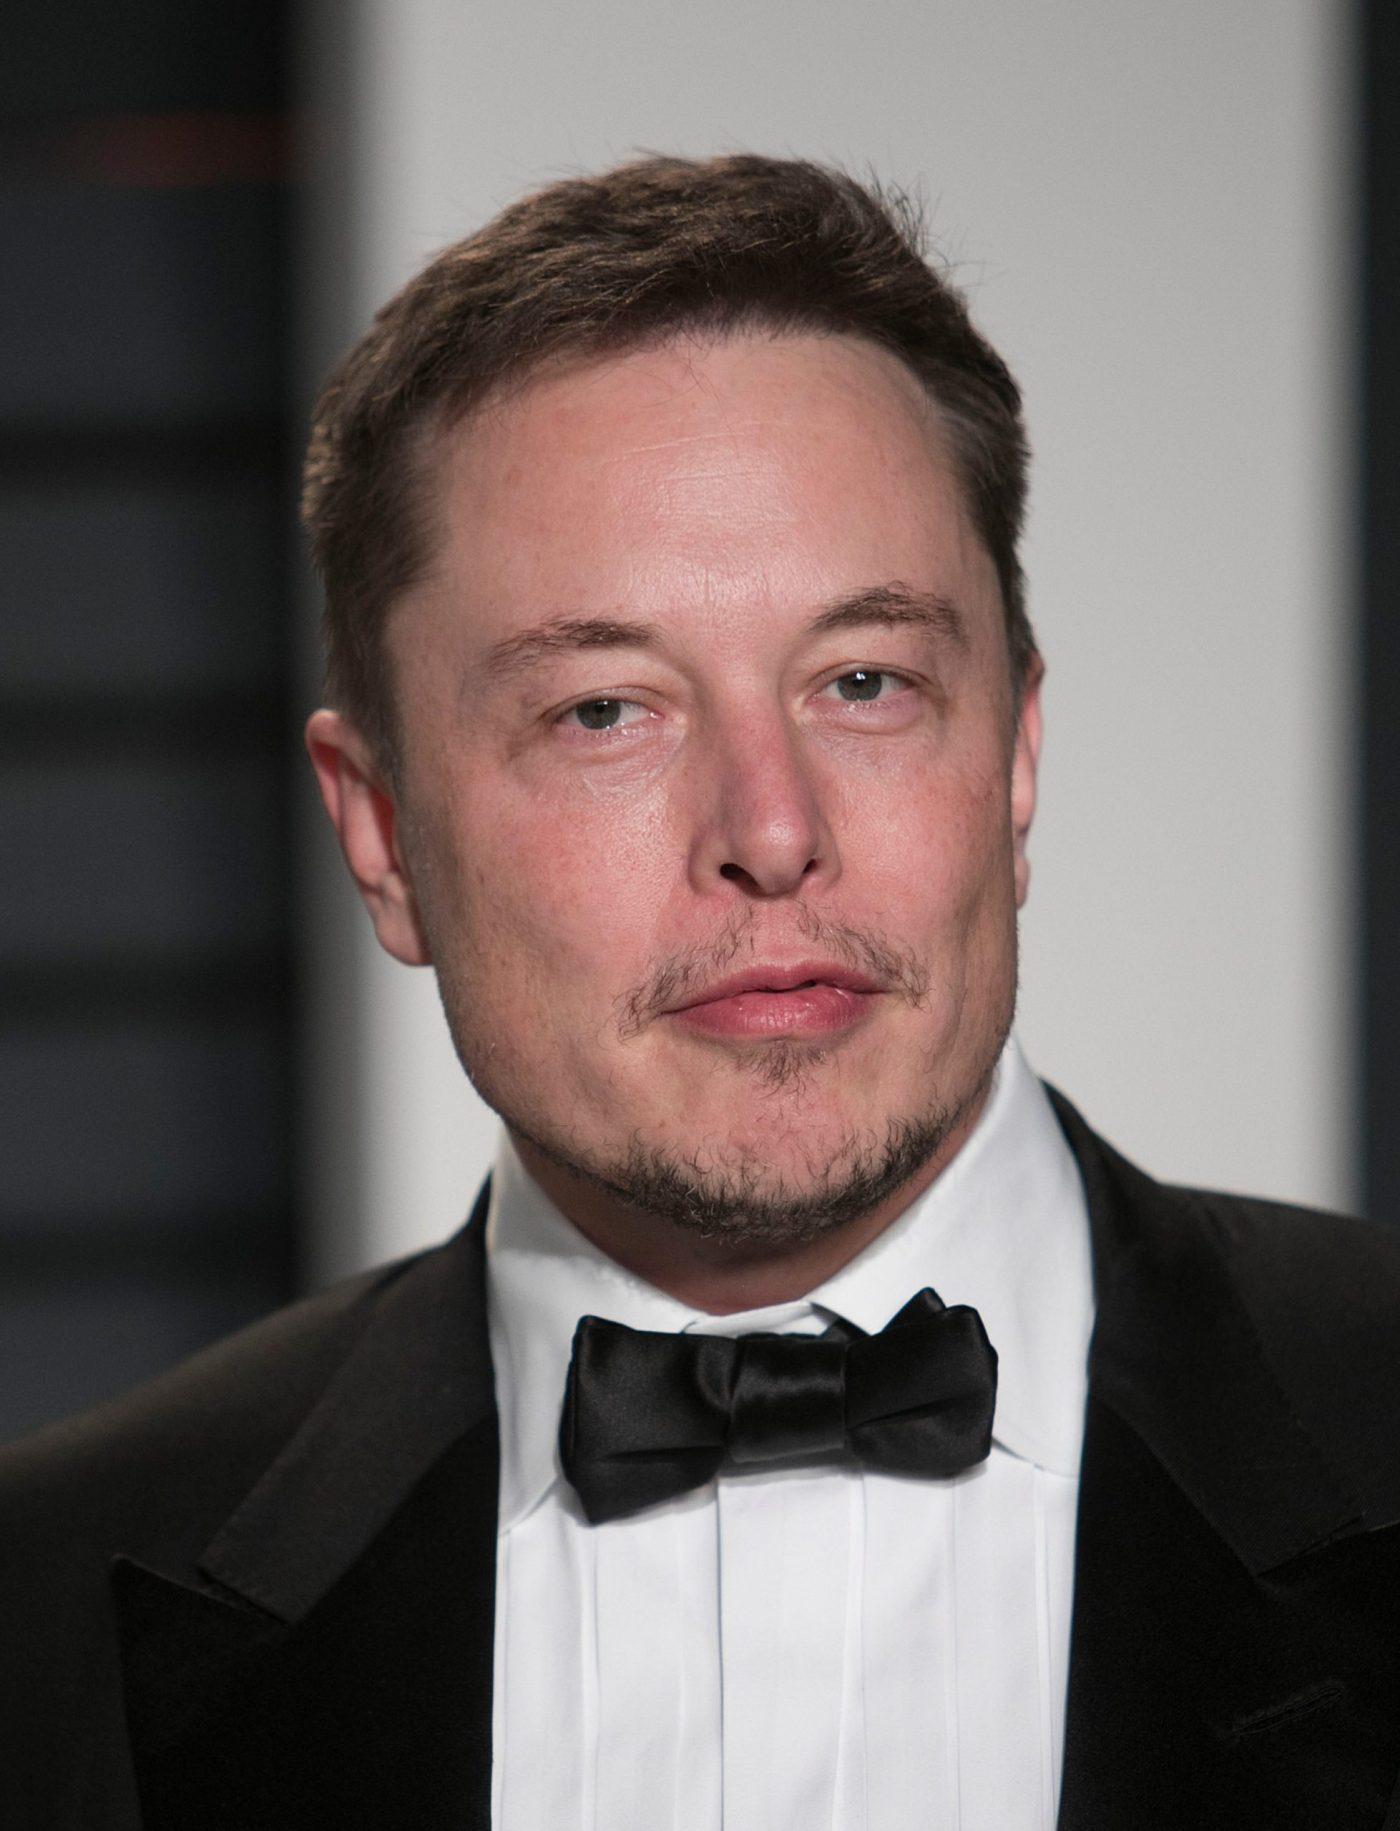 Telsa CEO, Elon Musk's Twitter account was also overtaken in the massive Twitter hack